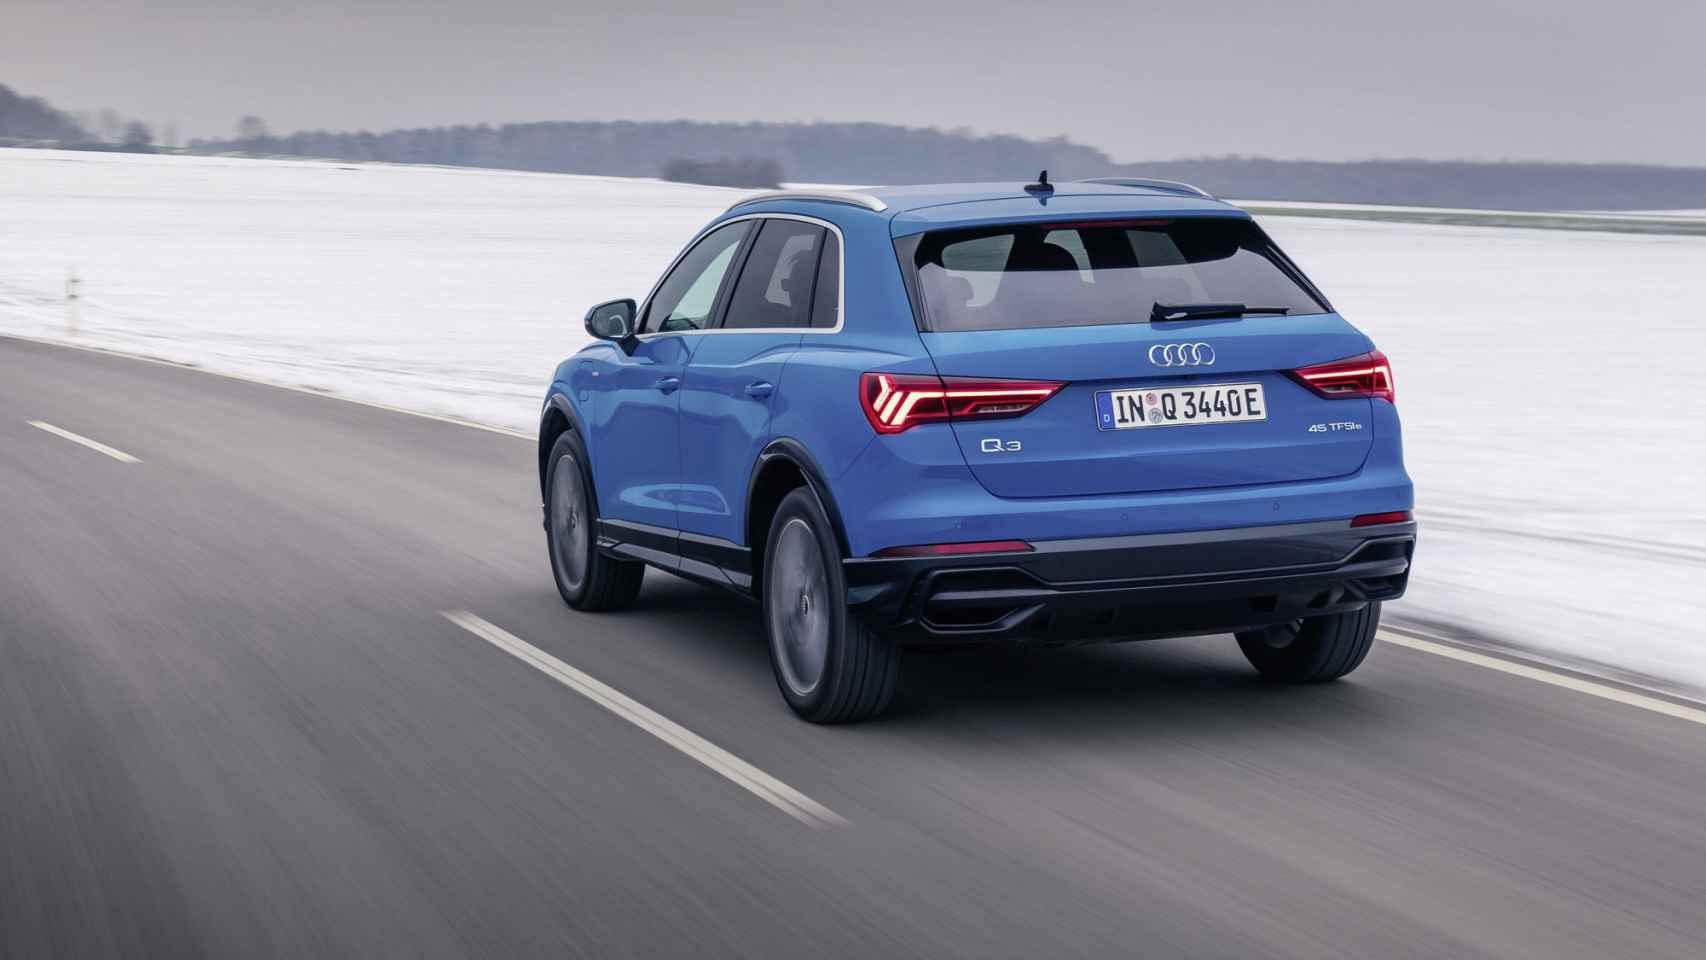 Audi lanza el Q3 híbrido enchufable